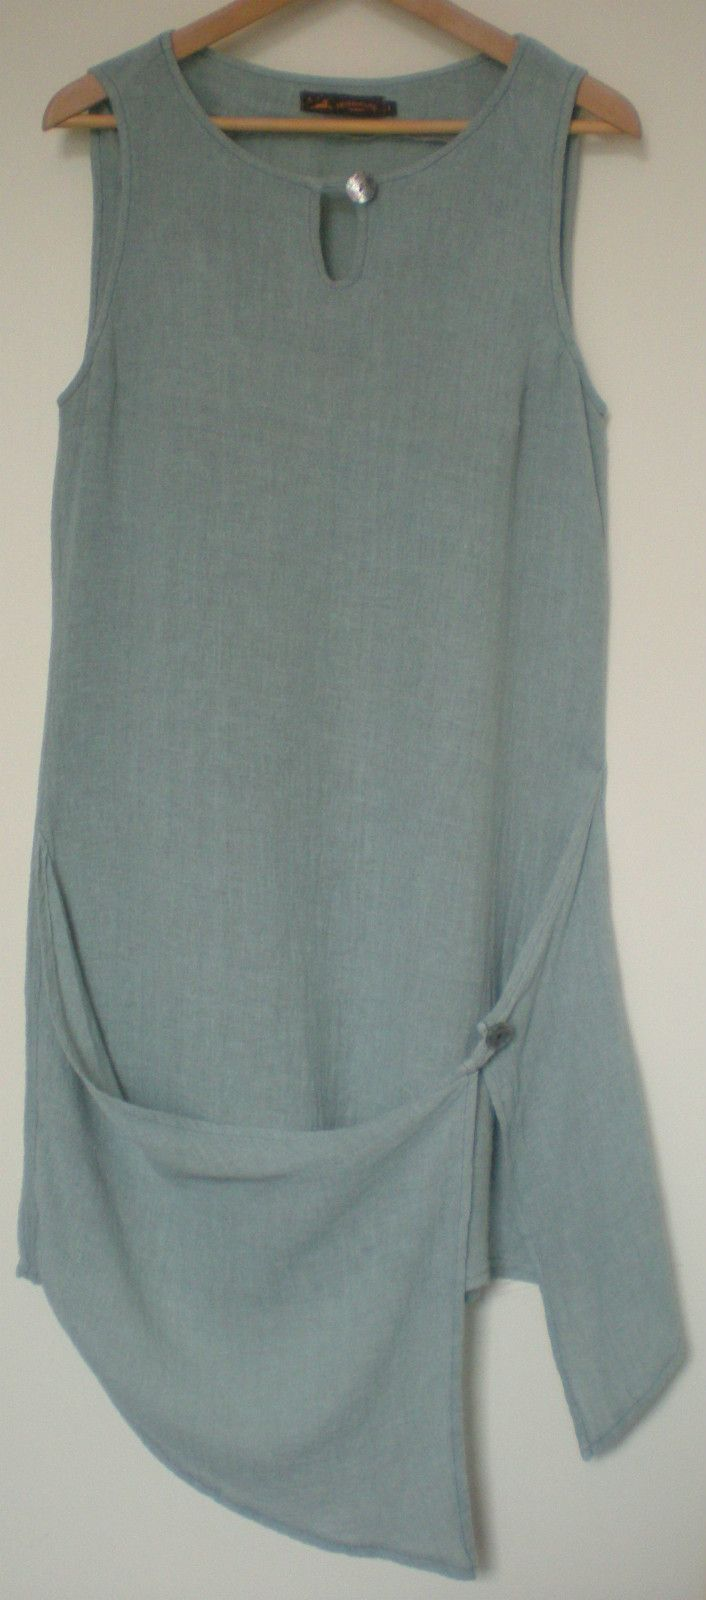 Heteroclite crinkle linen dress s1. M 12 ? apron front asymmetric lagenlook | eBay